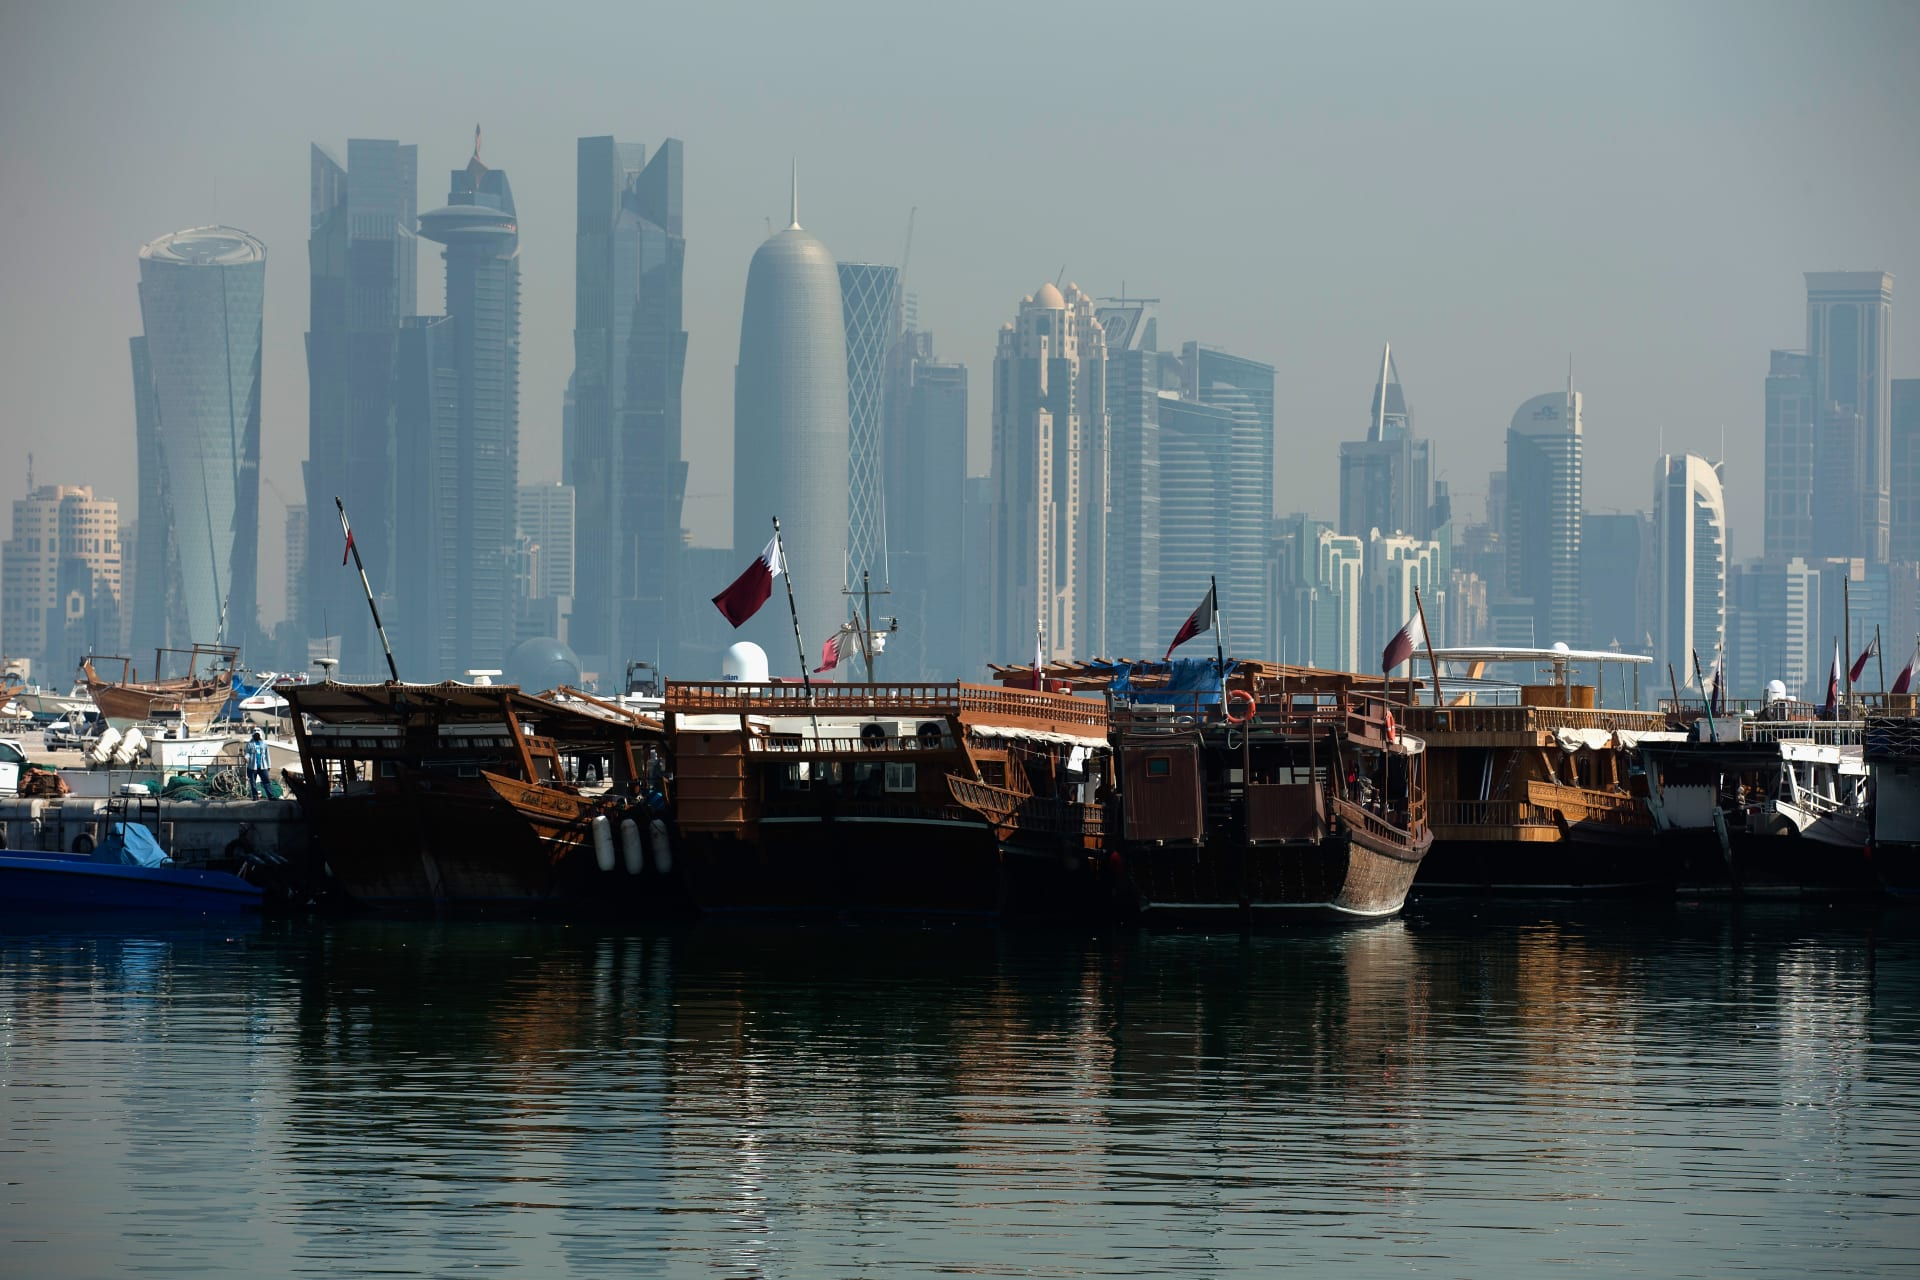 قطر تبيع سندات بـ12 مليار دولار.. والأسواق تغطيها 4 مرات